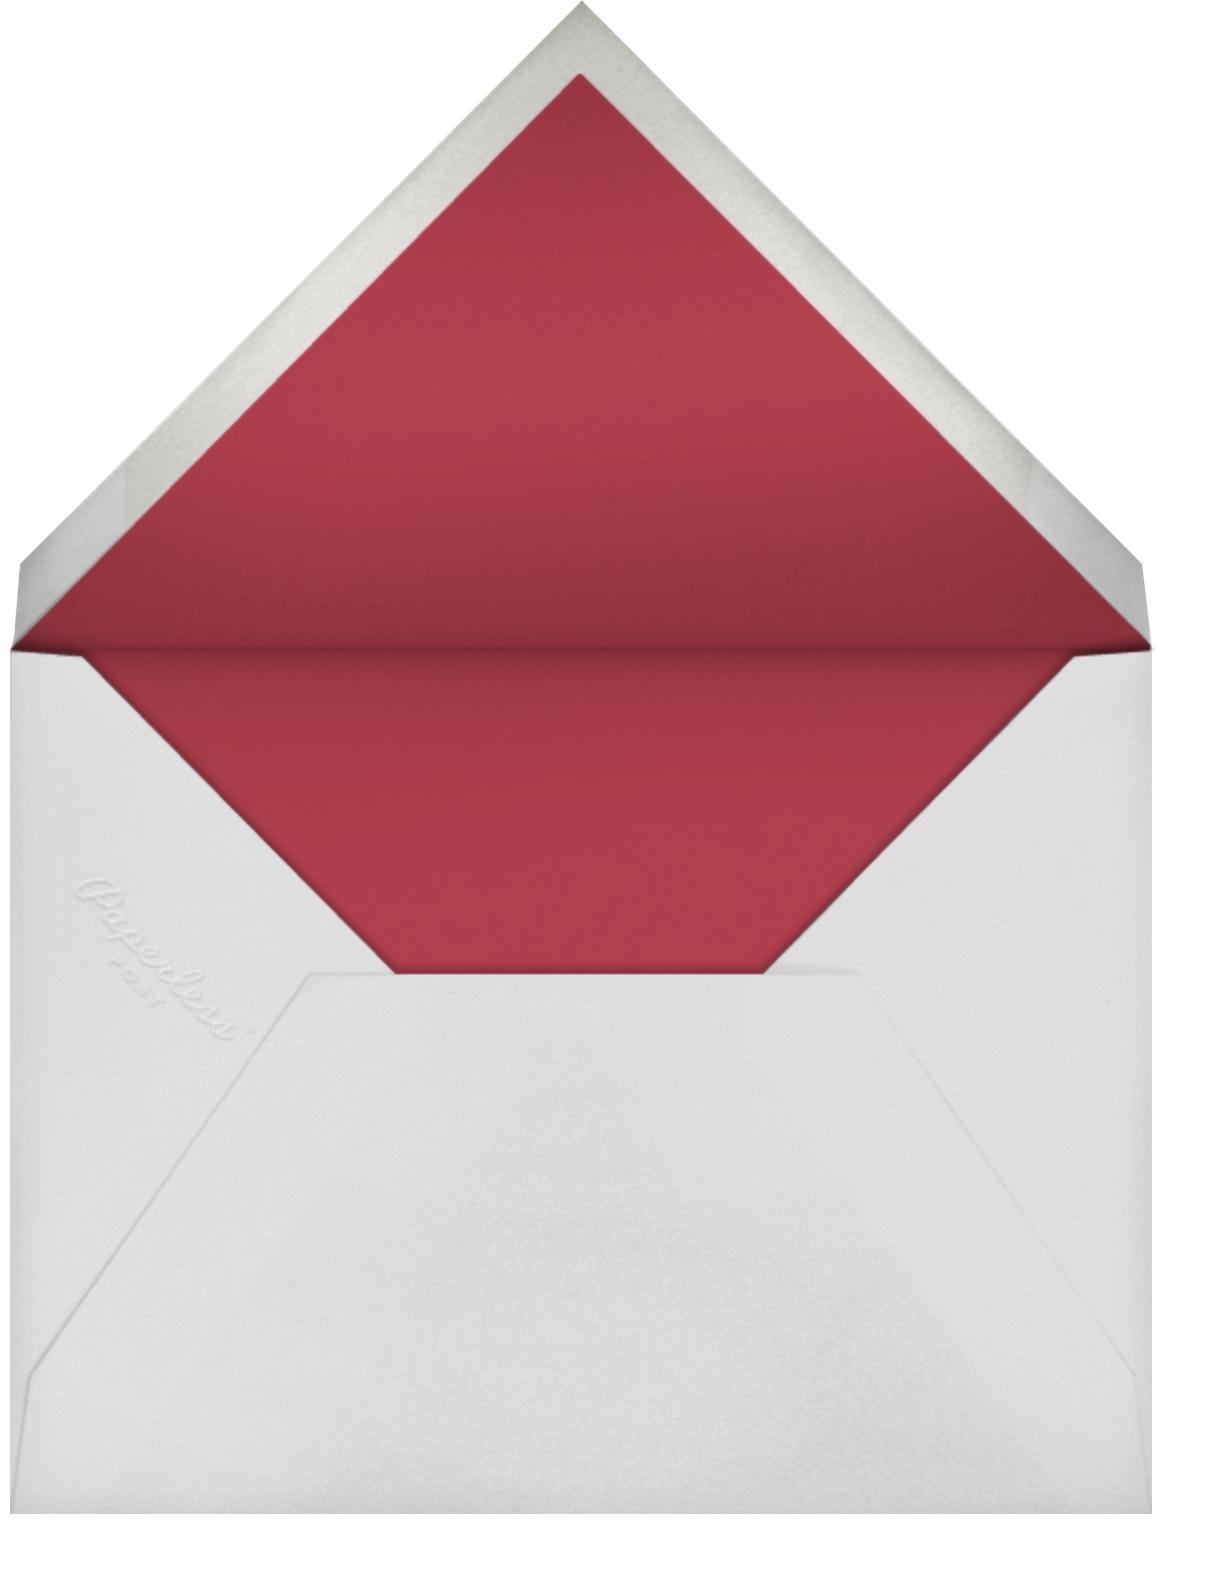 Falling Hearts - Merlot - kate spade new york - Envelope